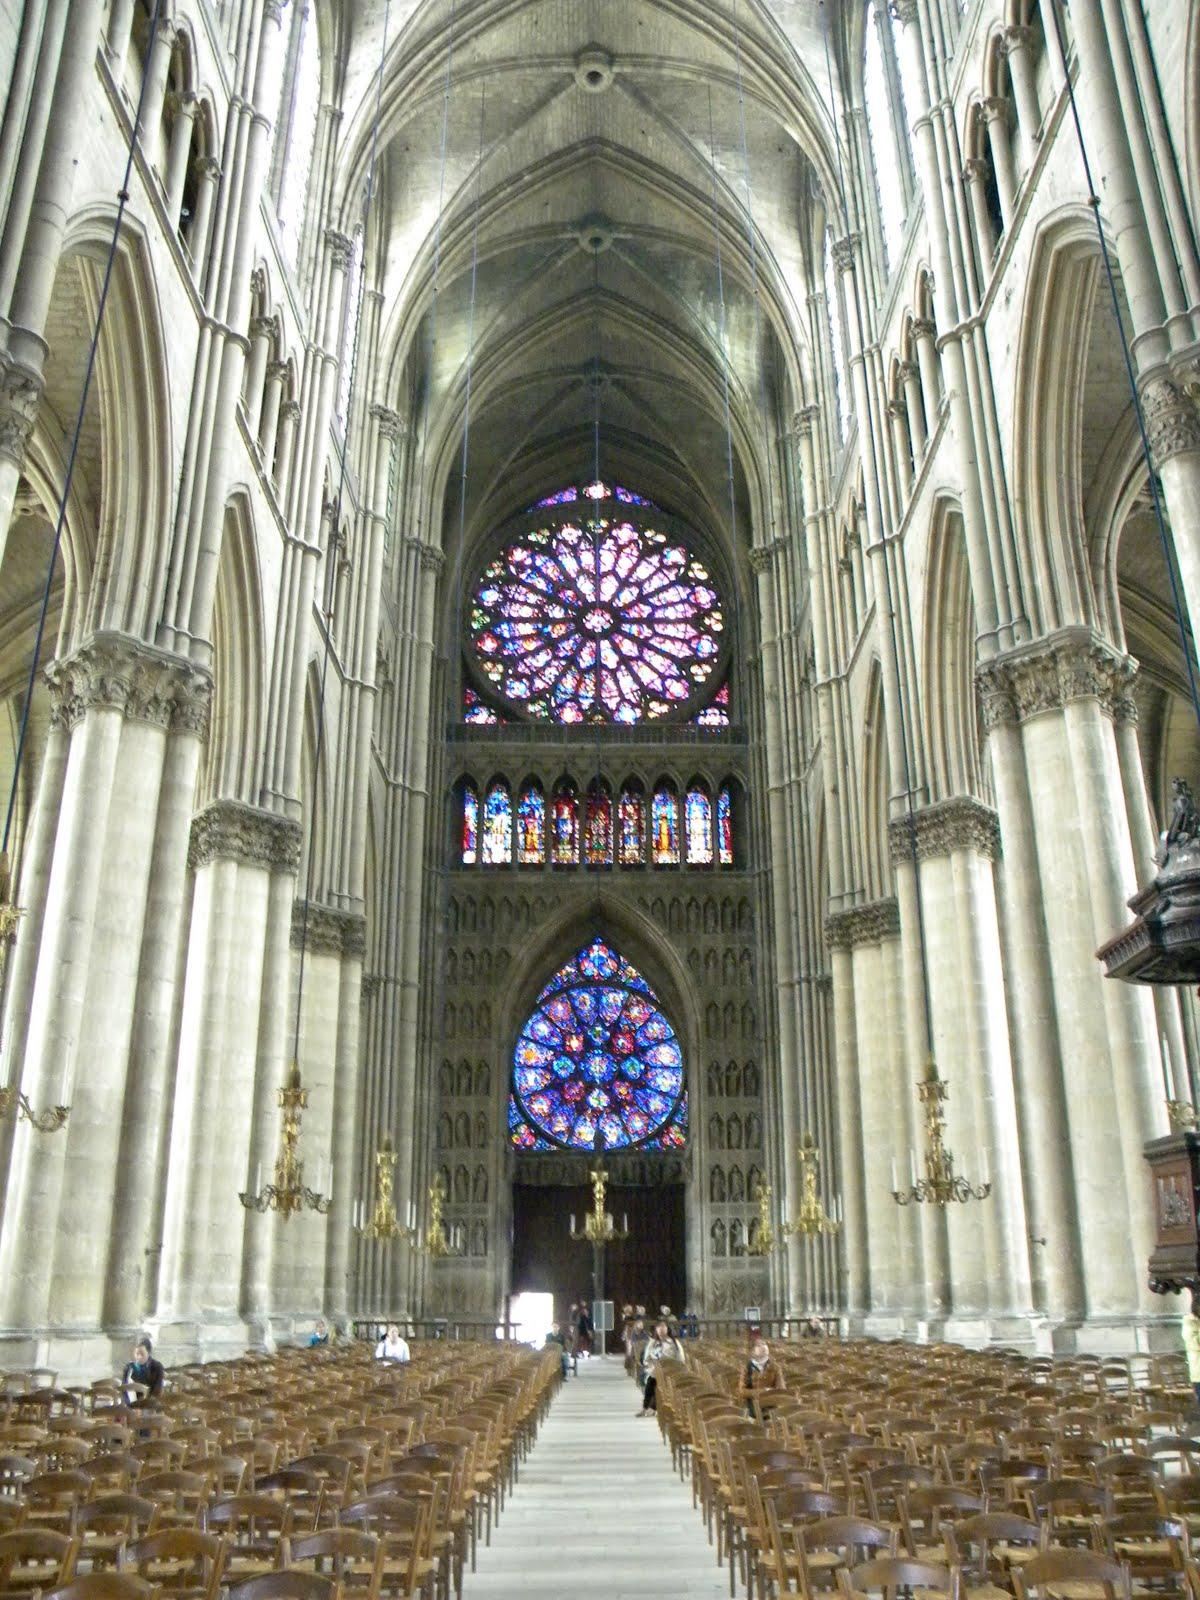 Professor Blanchard's Class Blog: Gothic Art